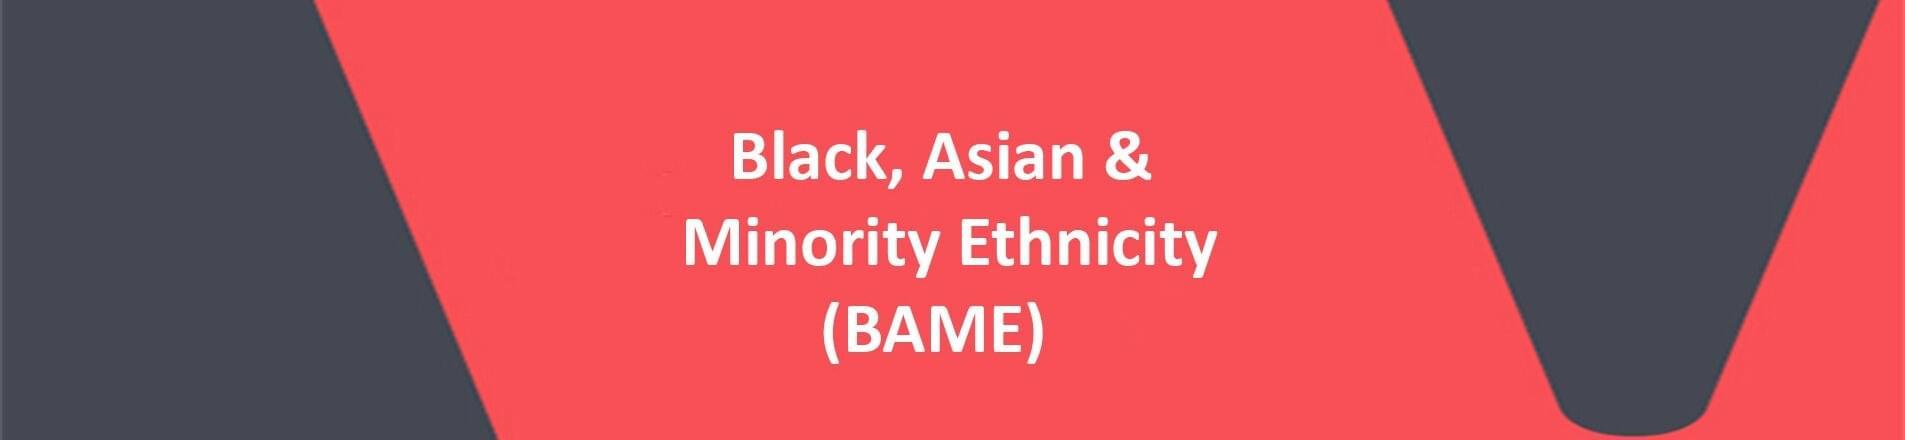 Black, Asian & Minority Ethnicity (BAME)